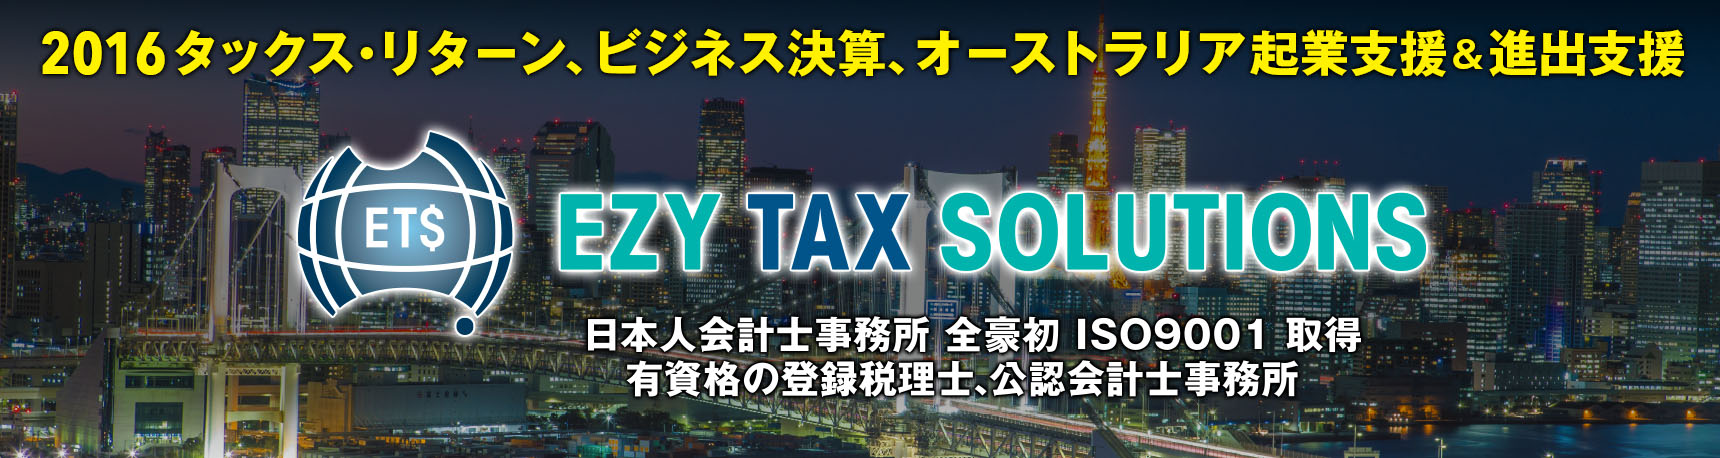 Ezy Tax Solutions